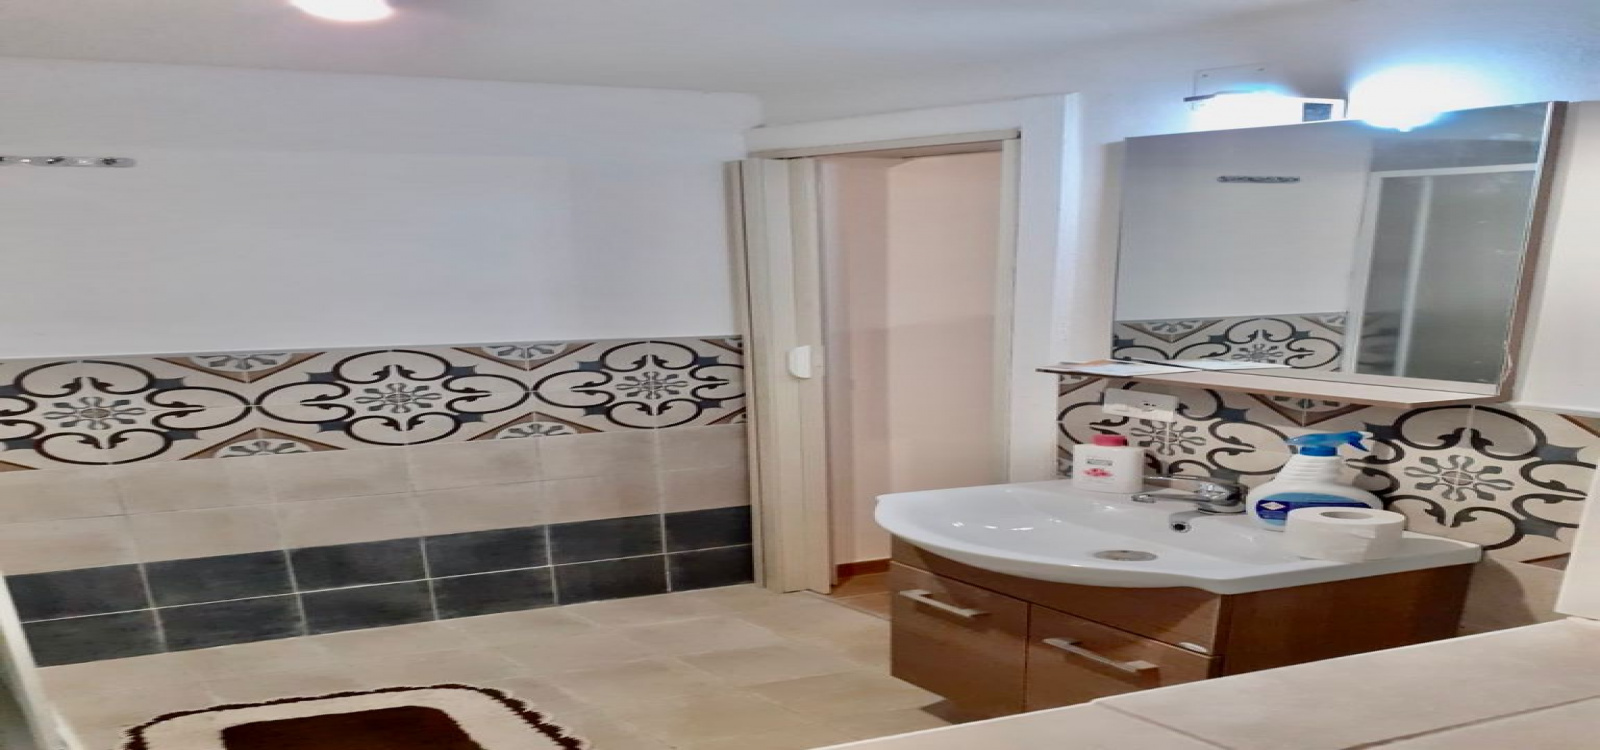 BORGATA,SIRACUSA,Appartamento,BORGATA,2427